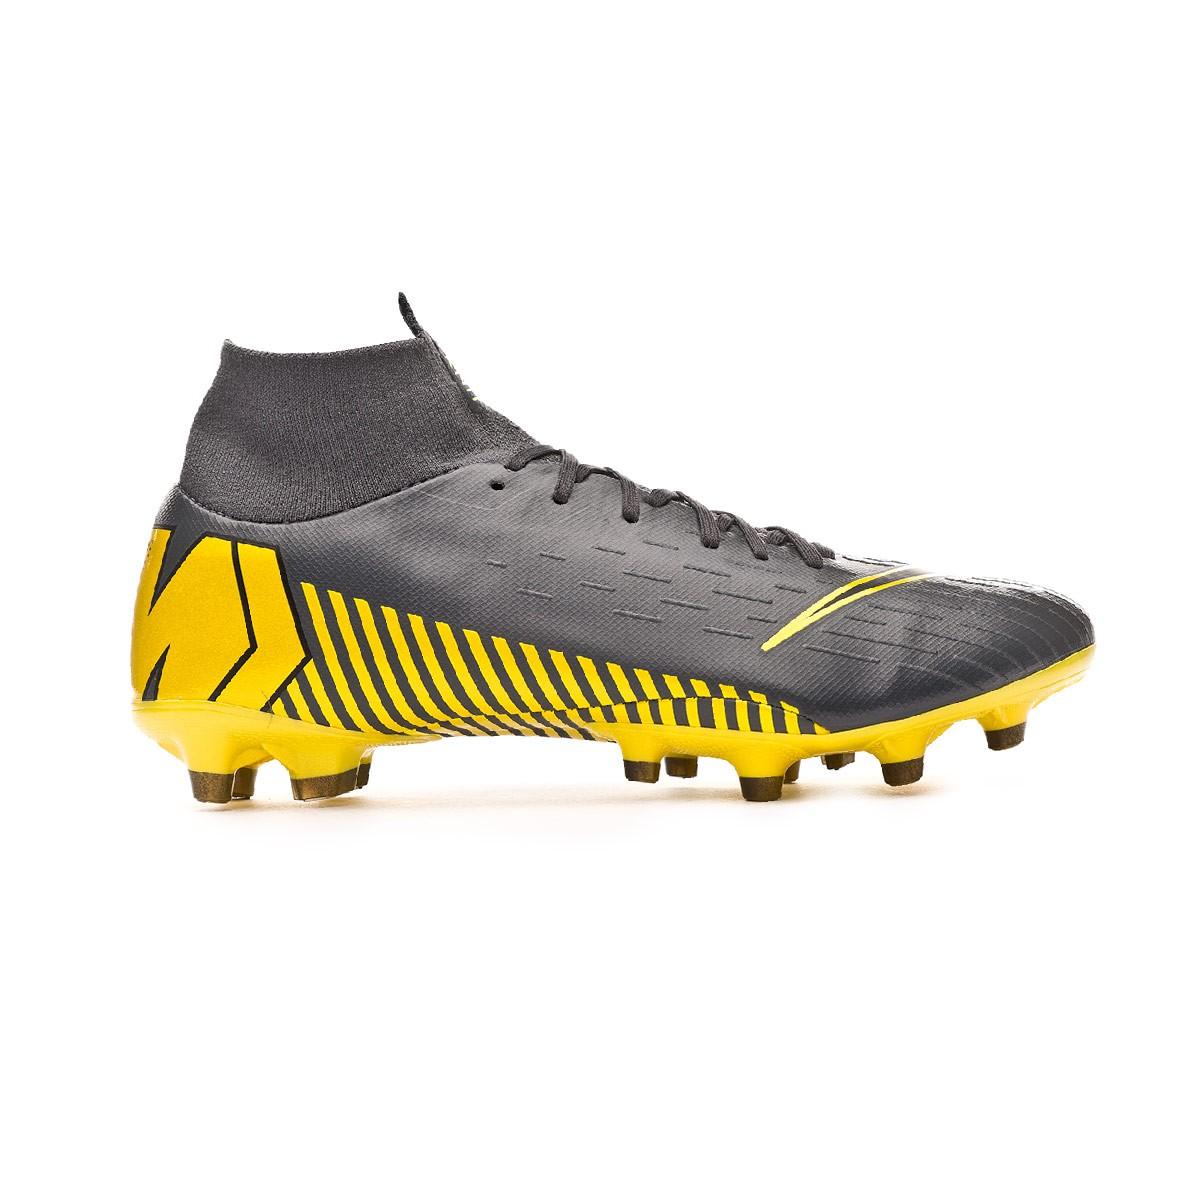 737e83633ab0e Boot Nike Mercurial Superfly VI Pro AG-Pro Dark grey-Black - Leaked soccer